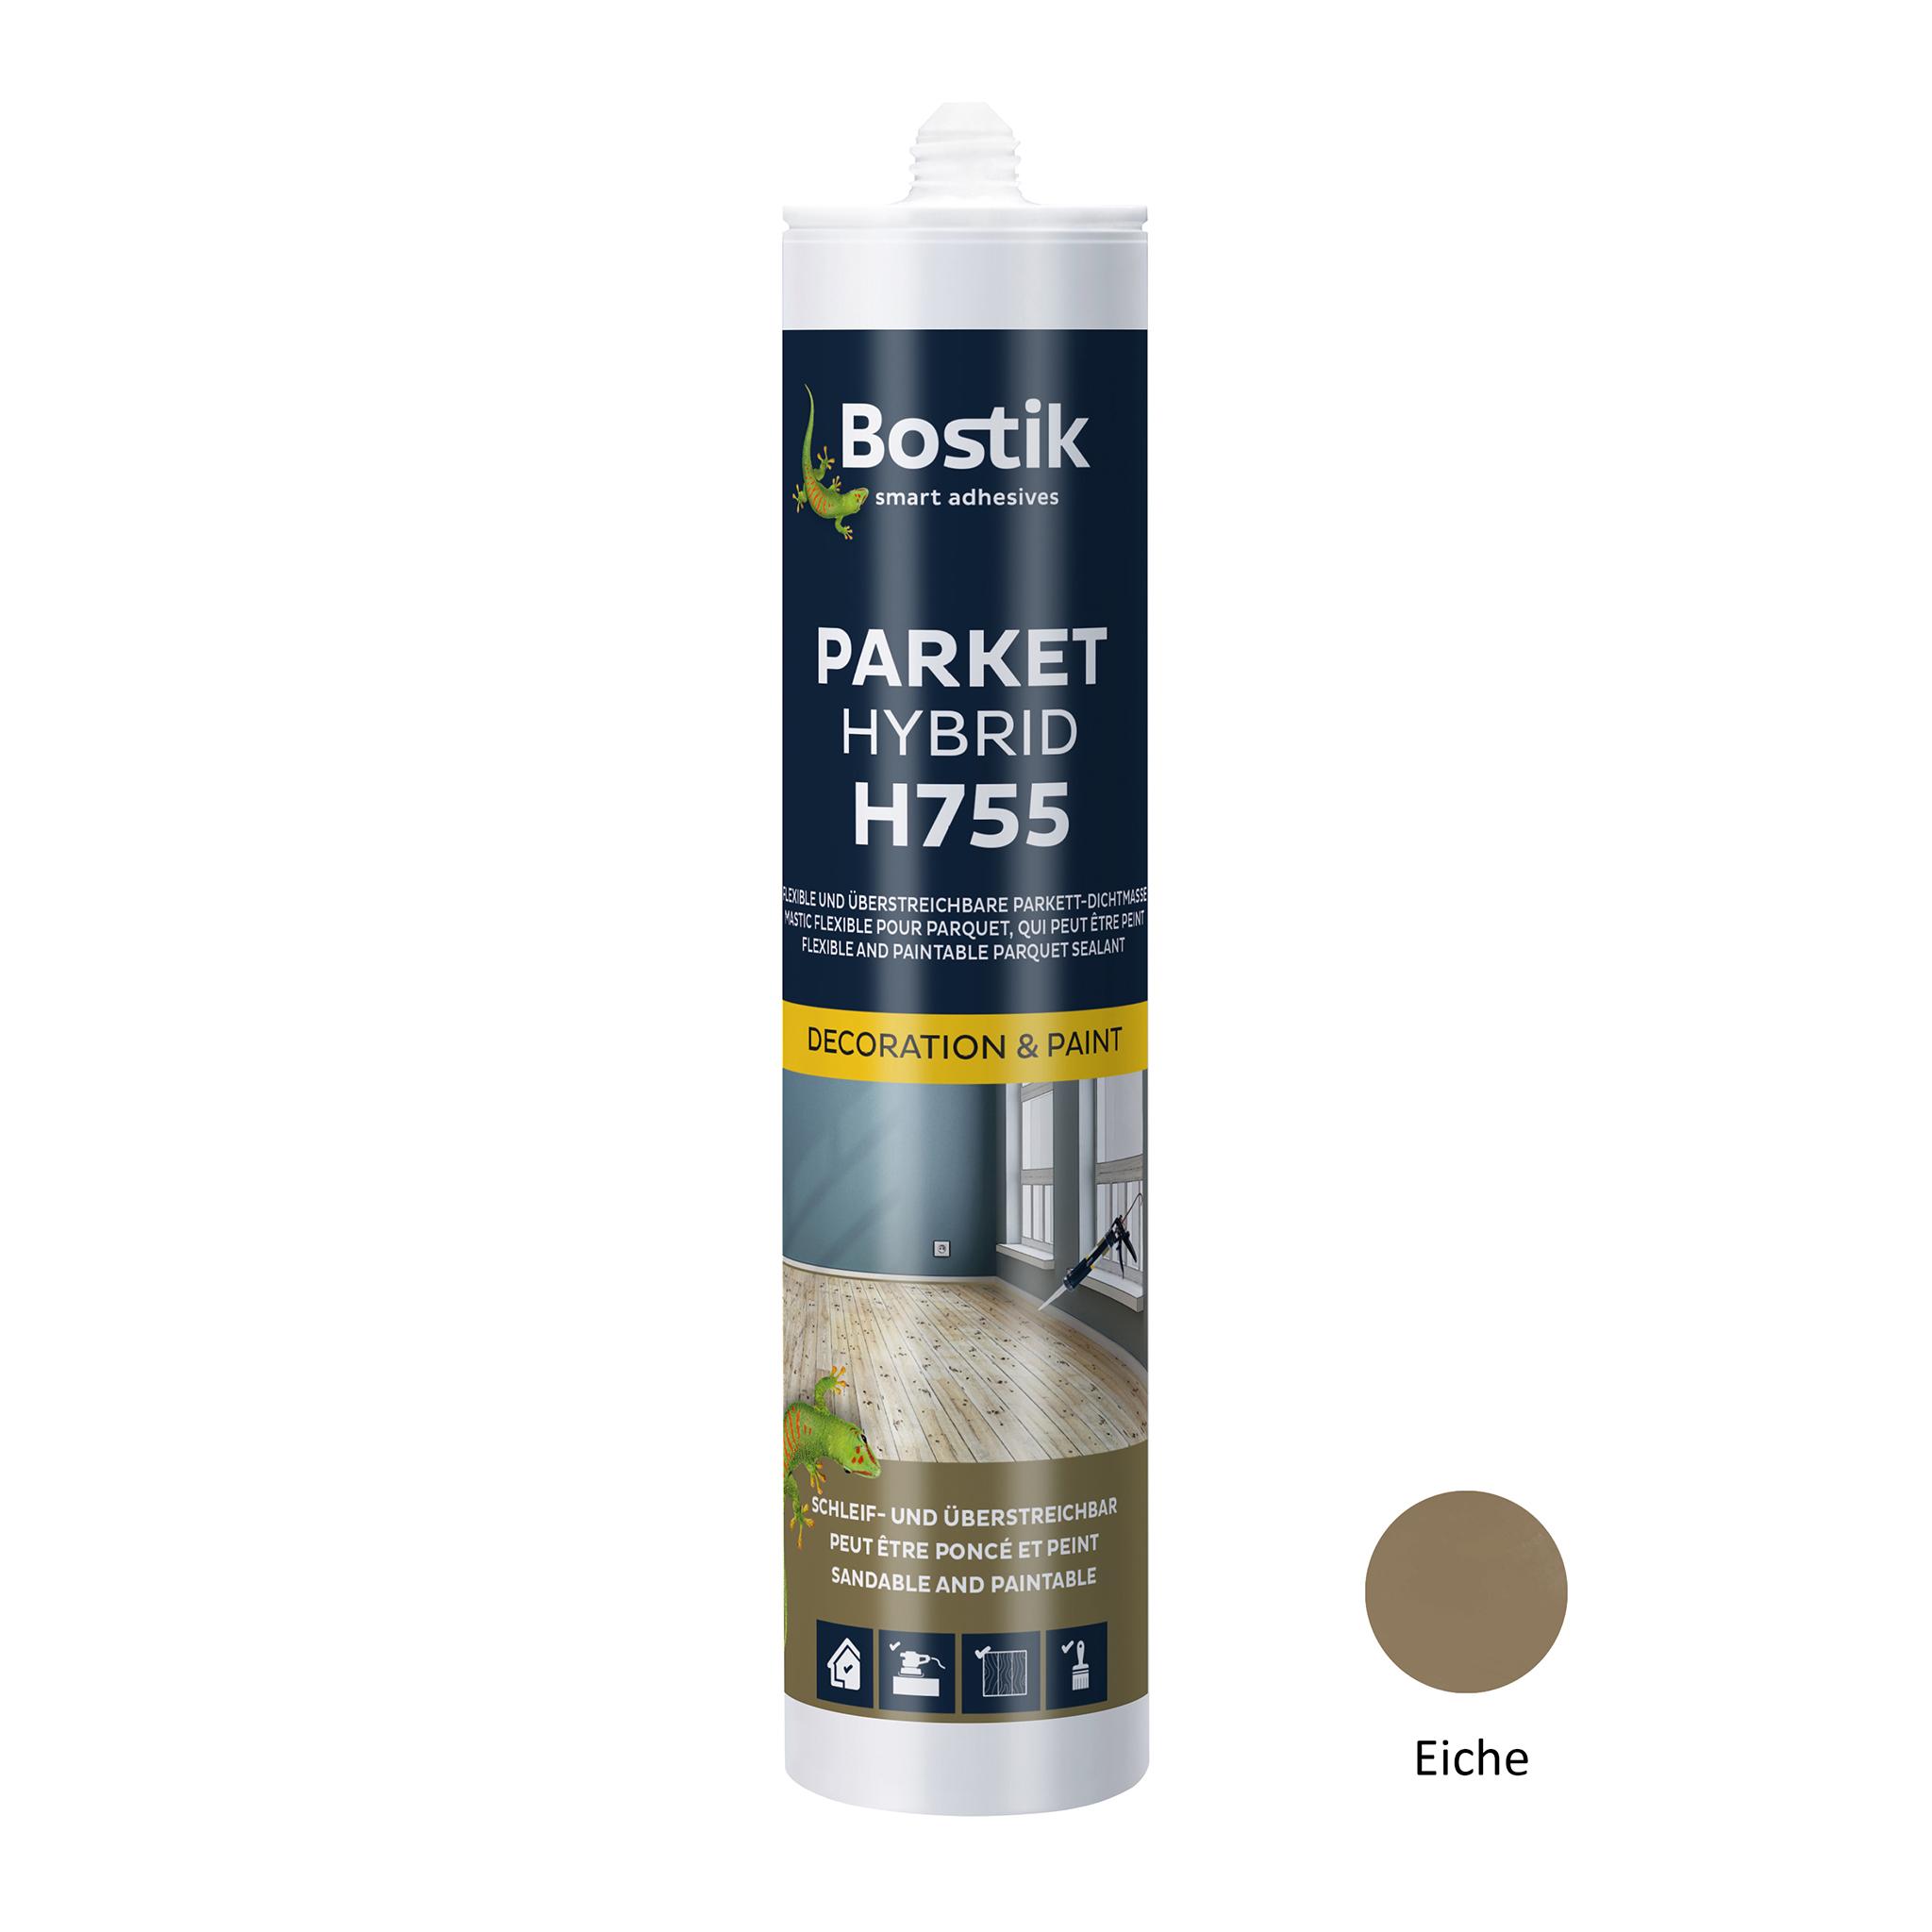 Bostik H755 Parkett Hybrid Eiche